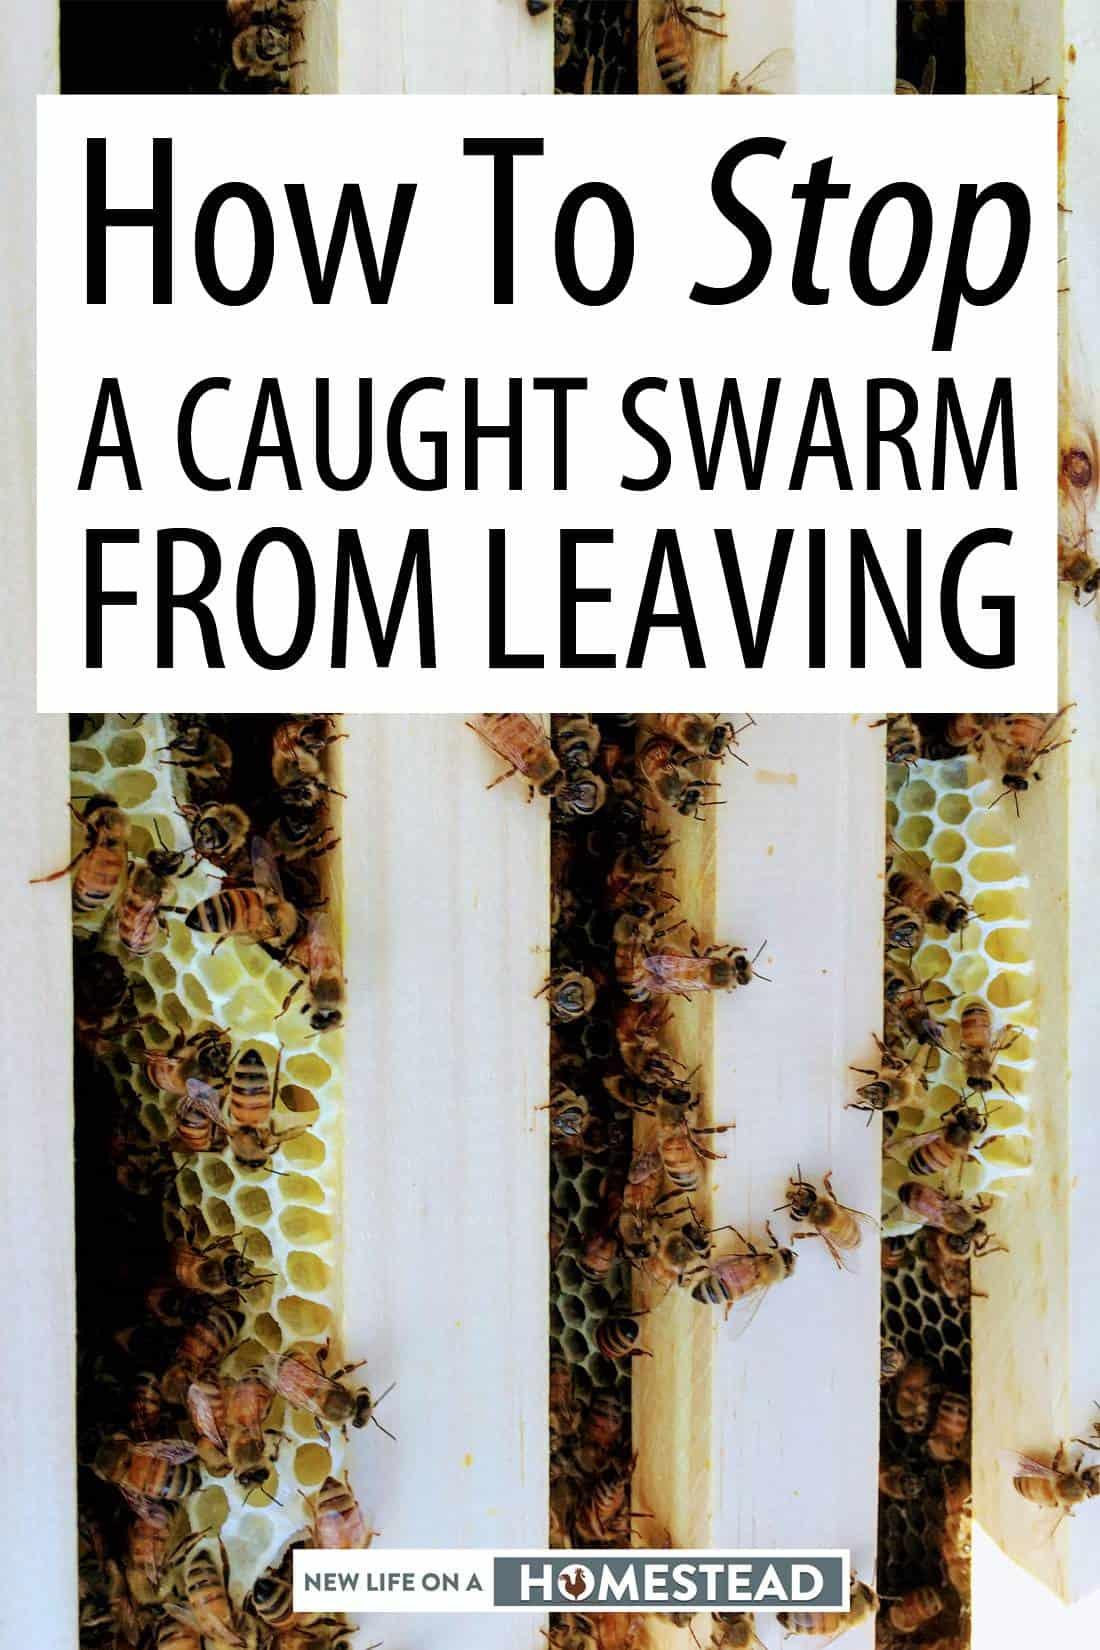 bees in beehive Pinterest image